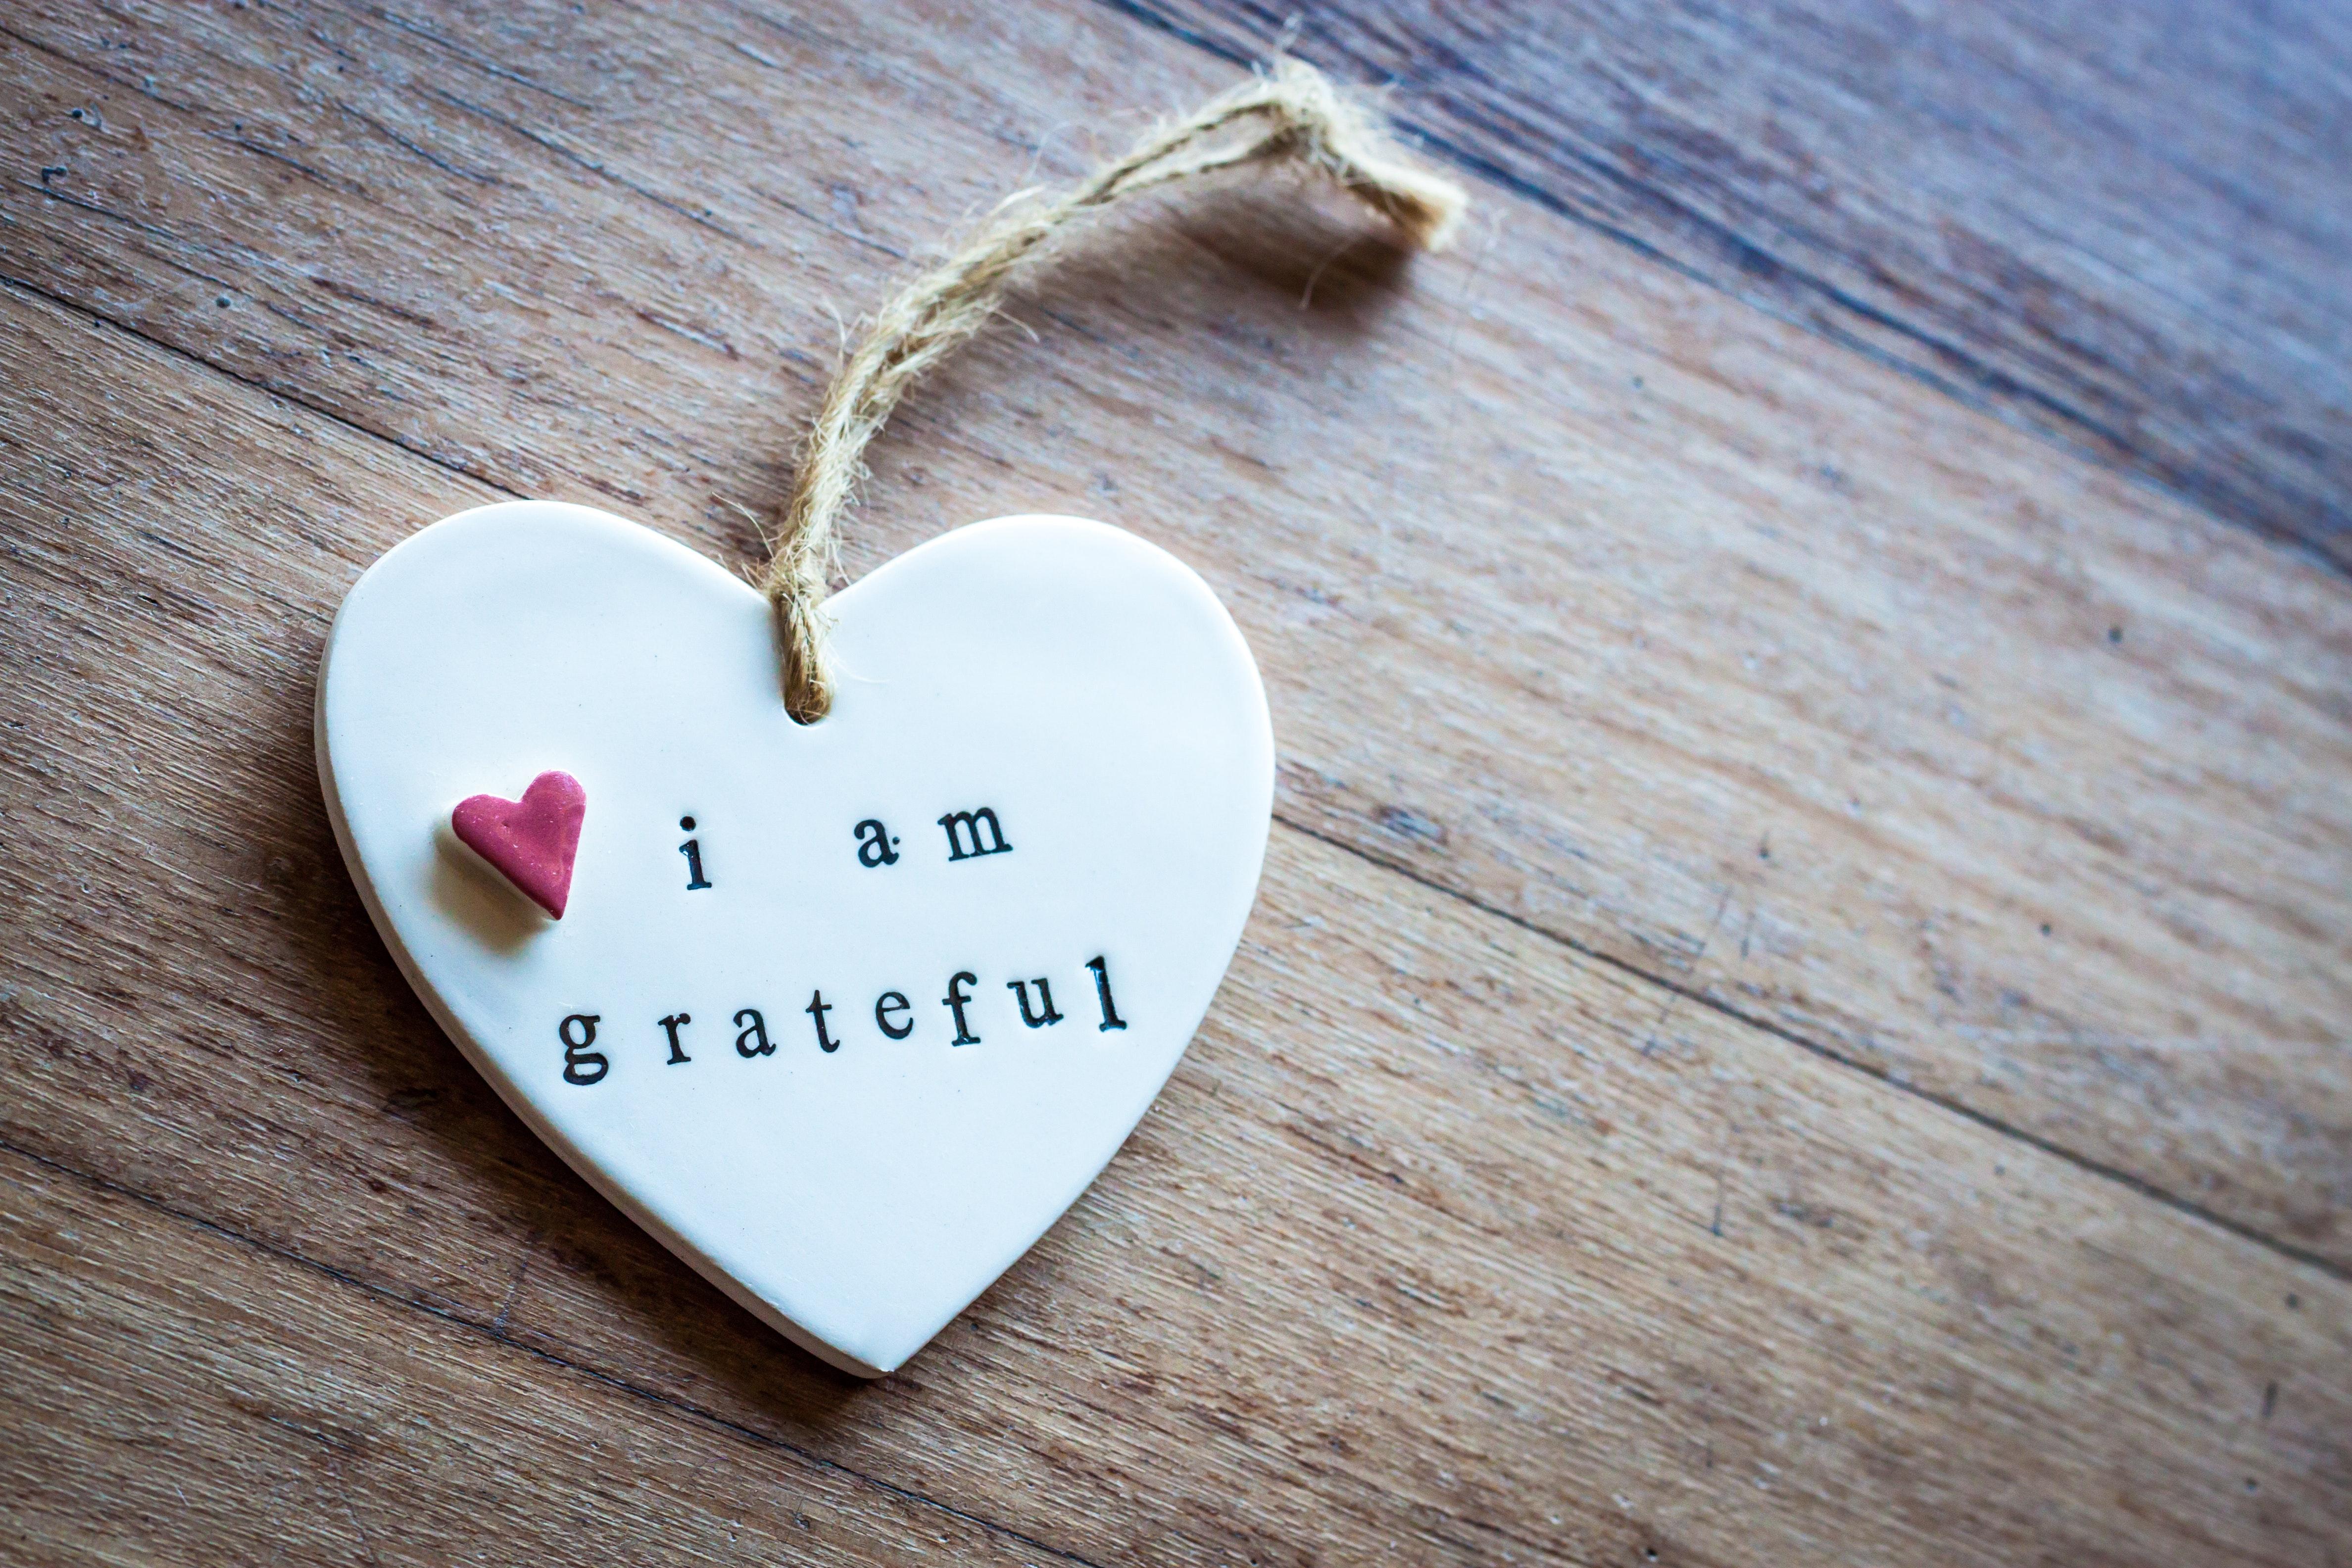 affection appreciation grateful